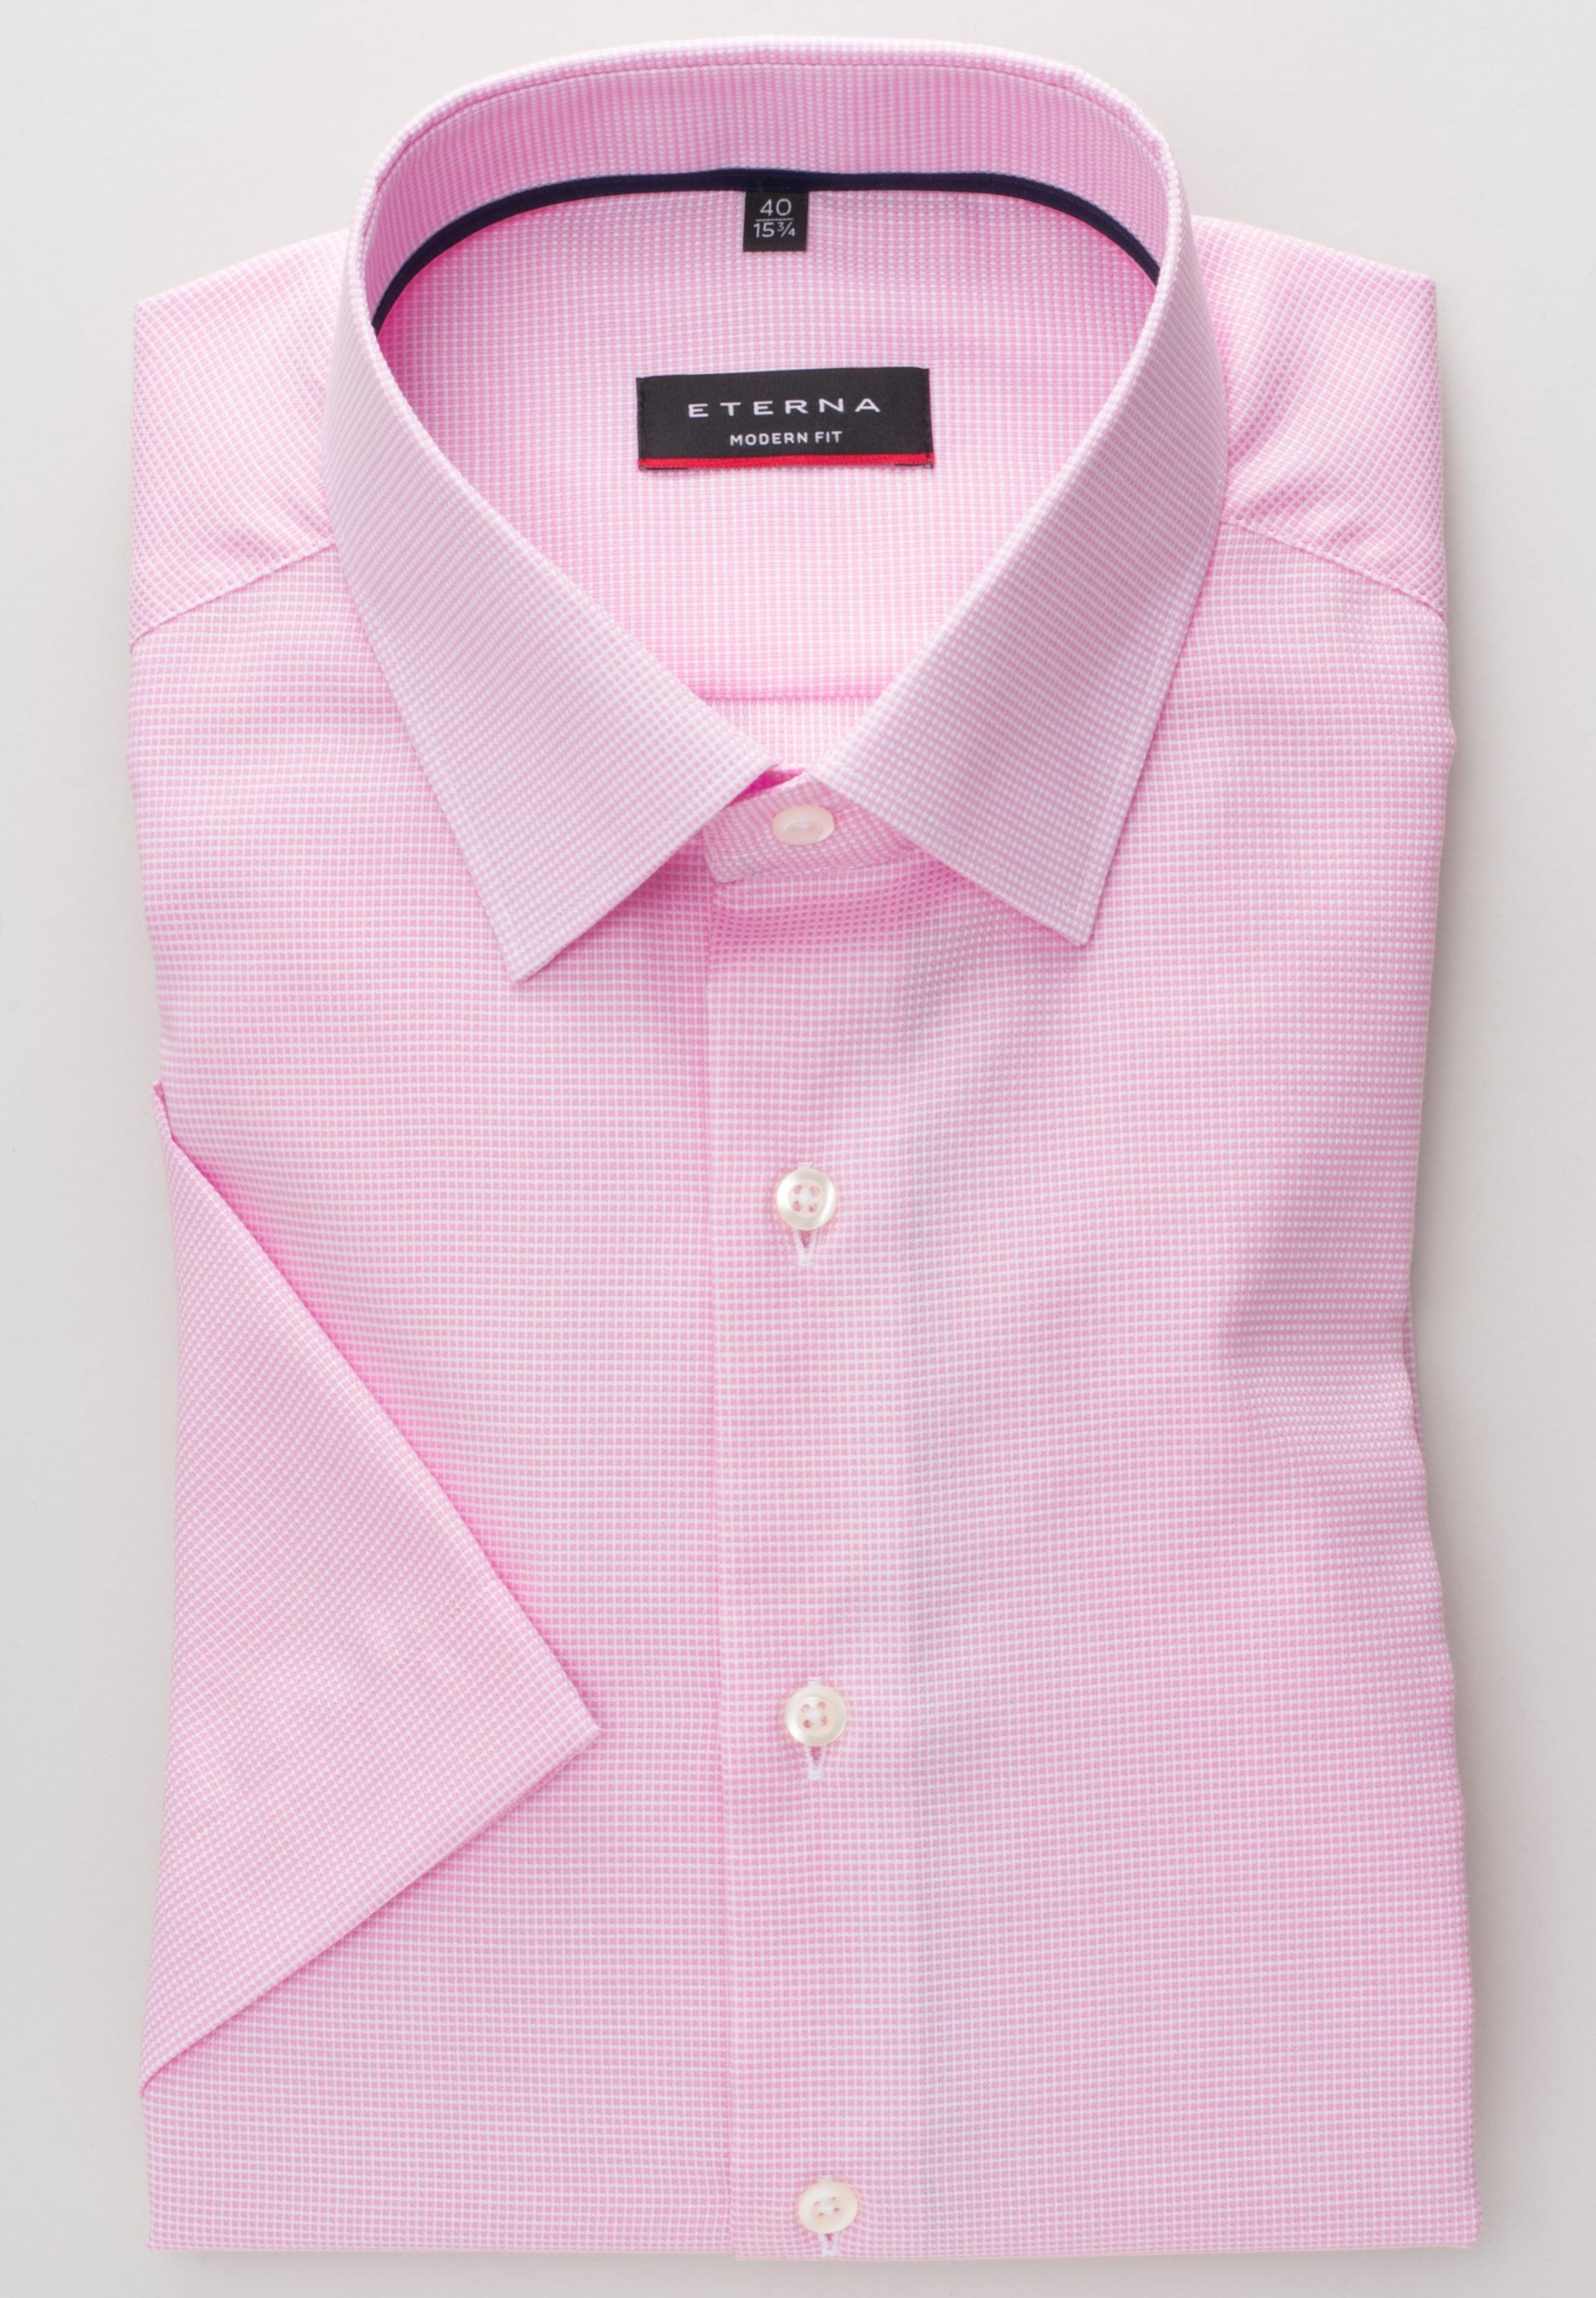 Hemd Eterna Weiß PinkSchwarz Eterna In Hemd In b76fgy